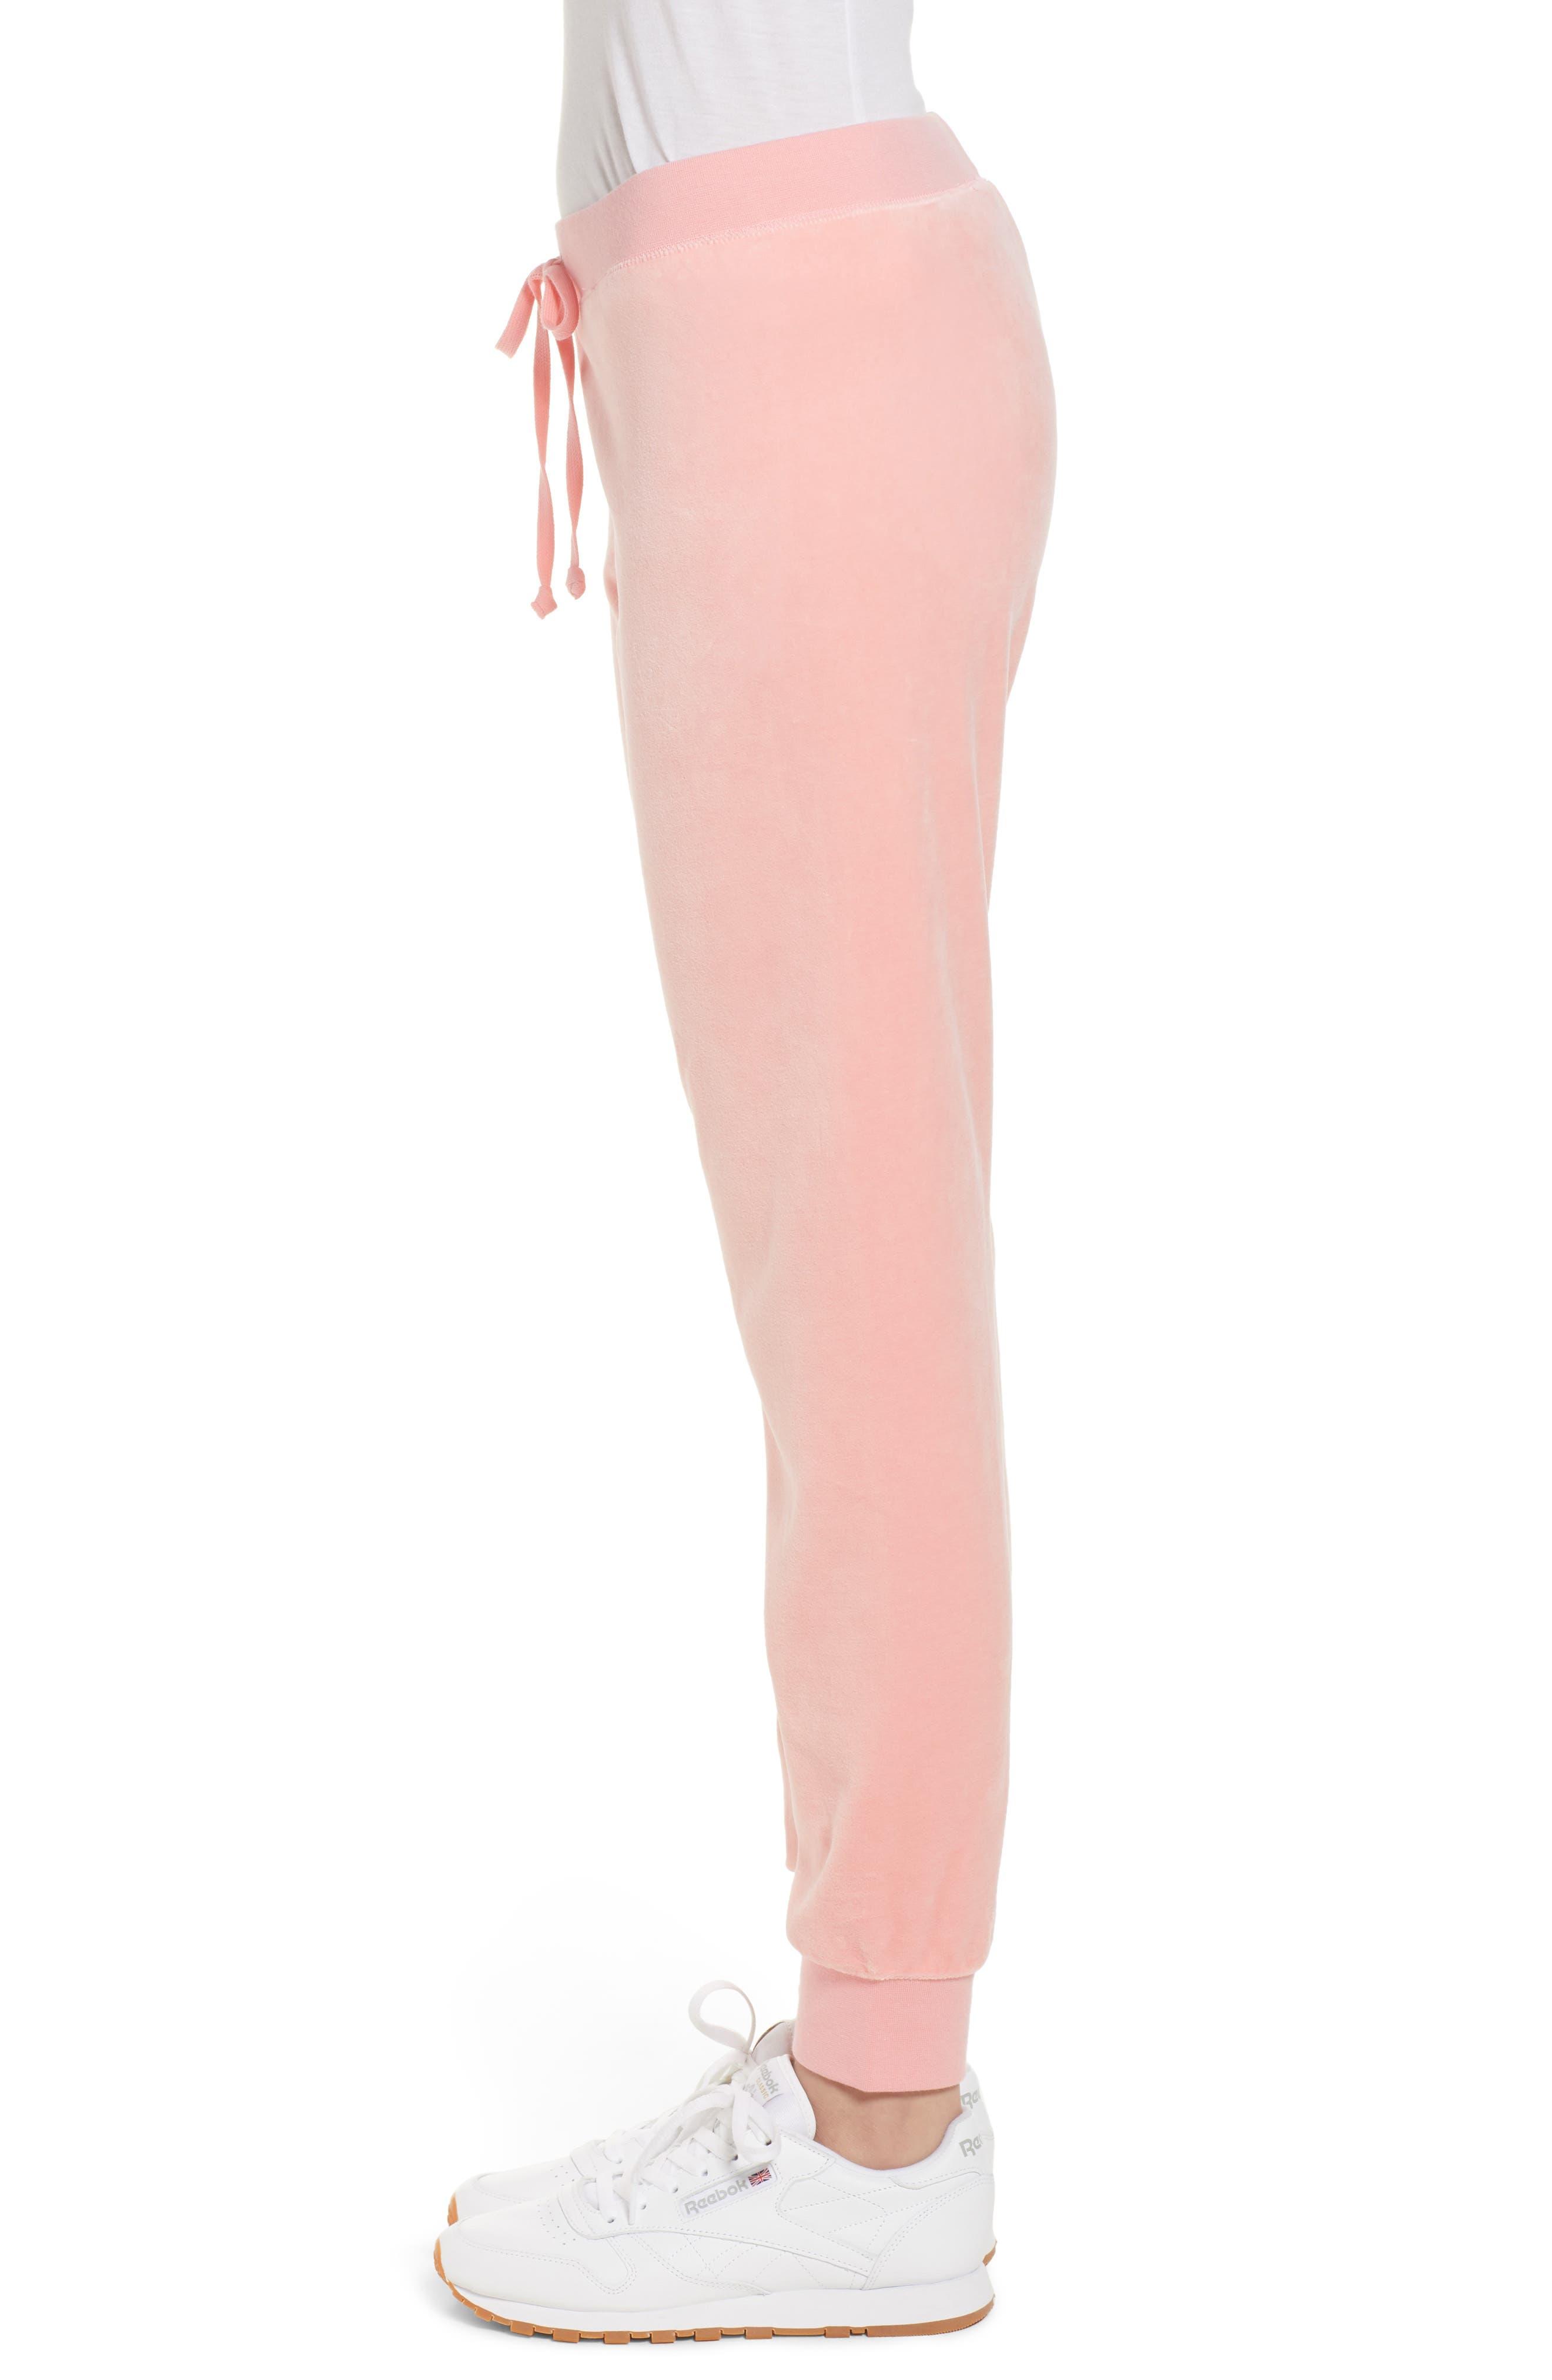 Zuma Velour Track Pants,                             Alternate thumbnail 3, color,                             Sorbet Pink